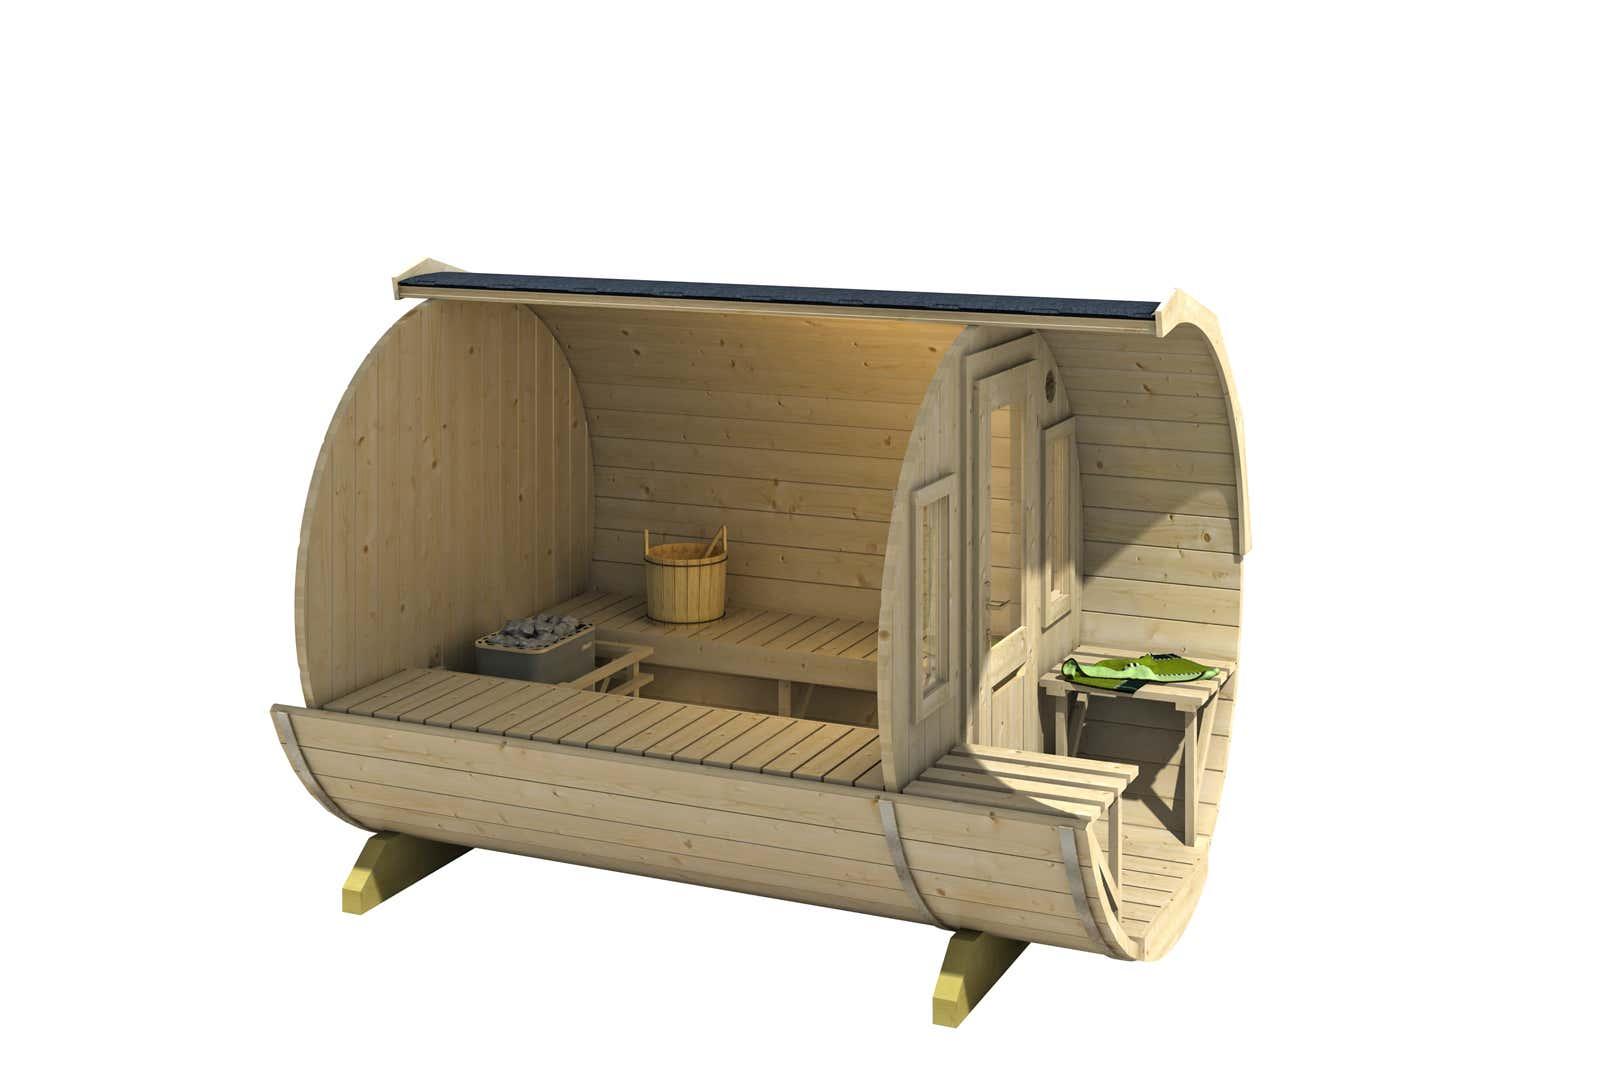 fass sauna modell sam mit harvia elektro ofen fass sauna modell sam mit harvia elektro ofen a. Black Bedroom Furniture Sets. Home Design Ideas